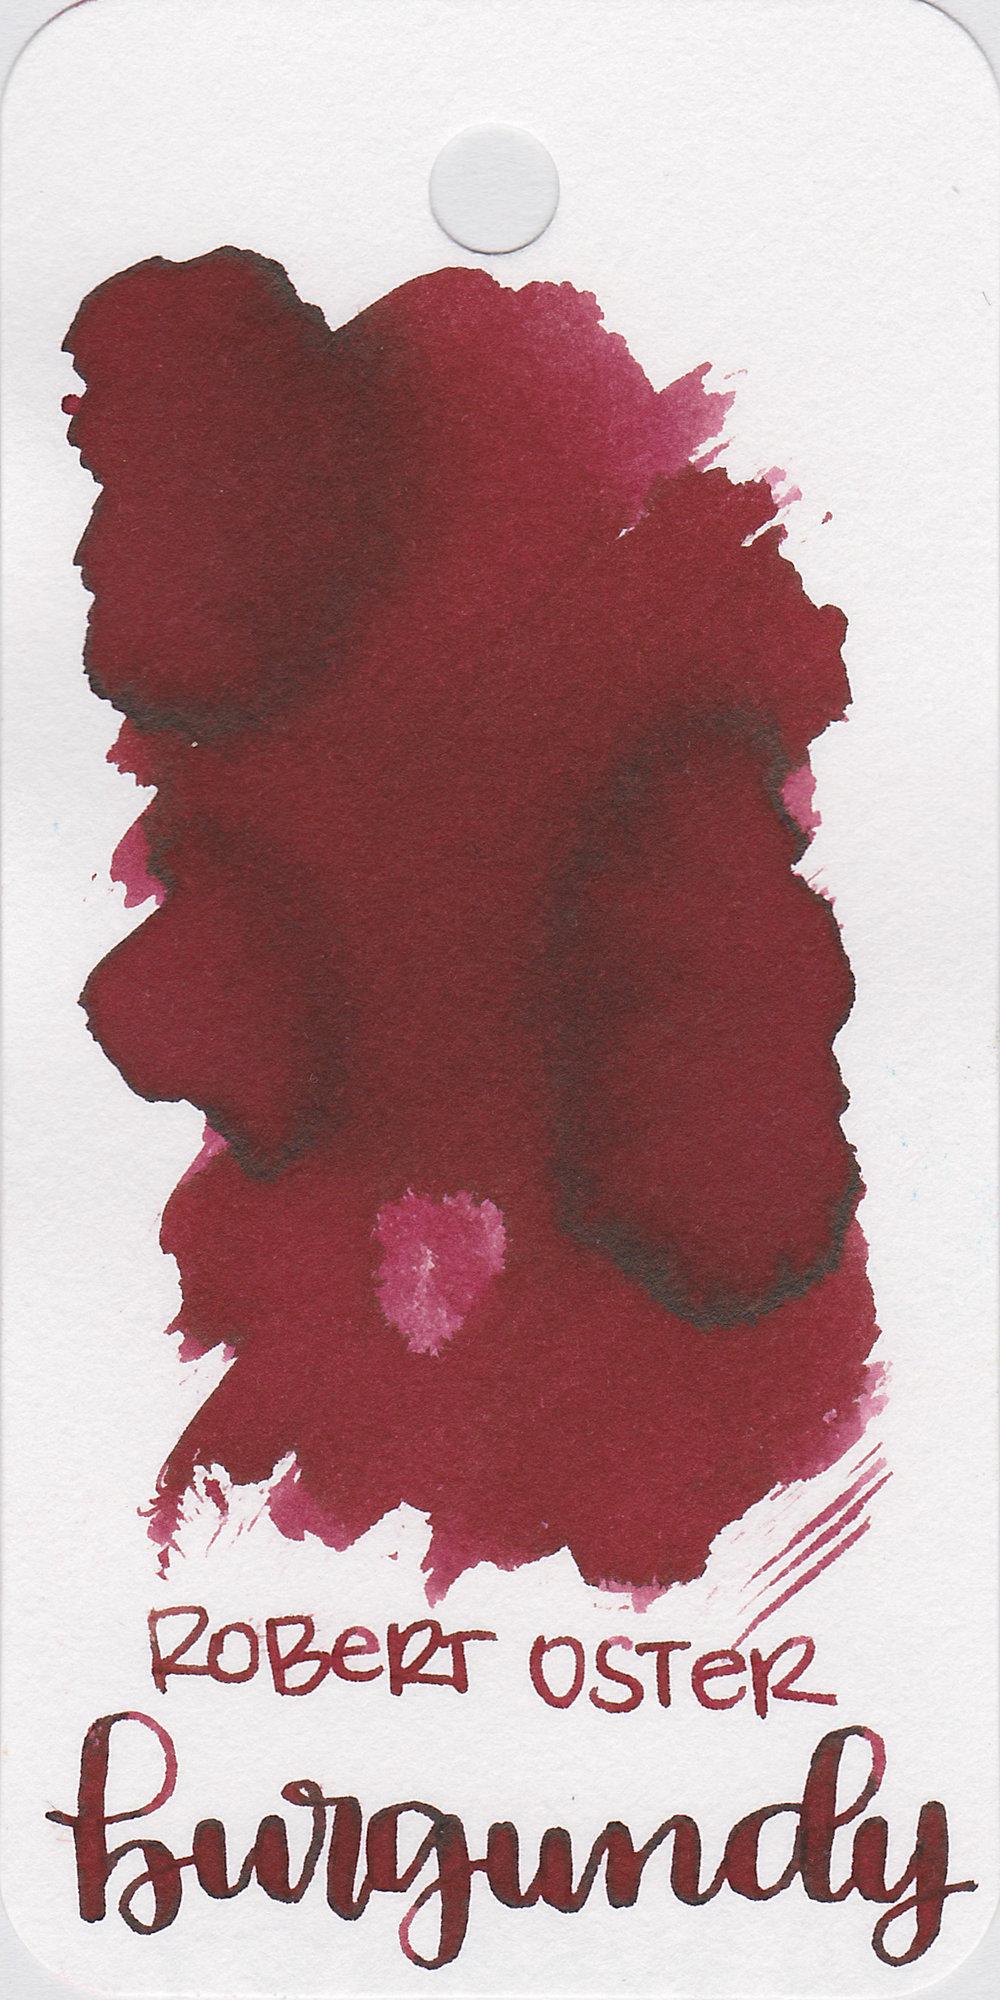 ro-burgundy-1.jpg